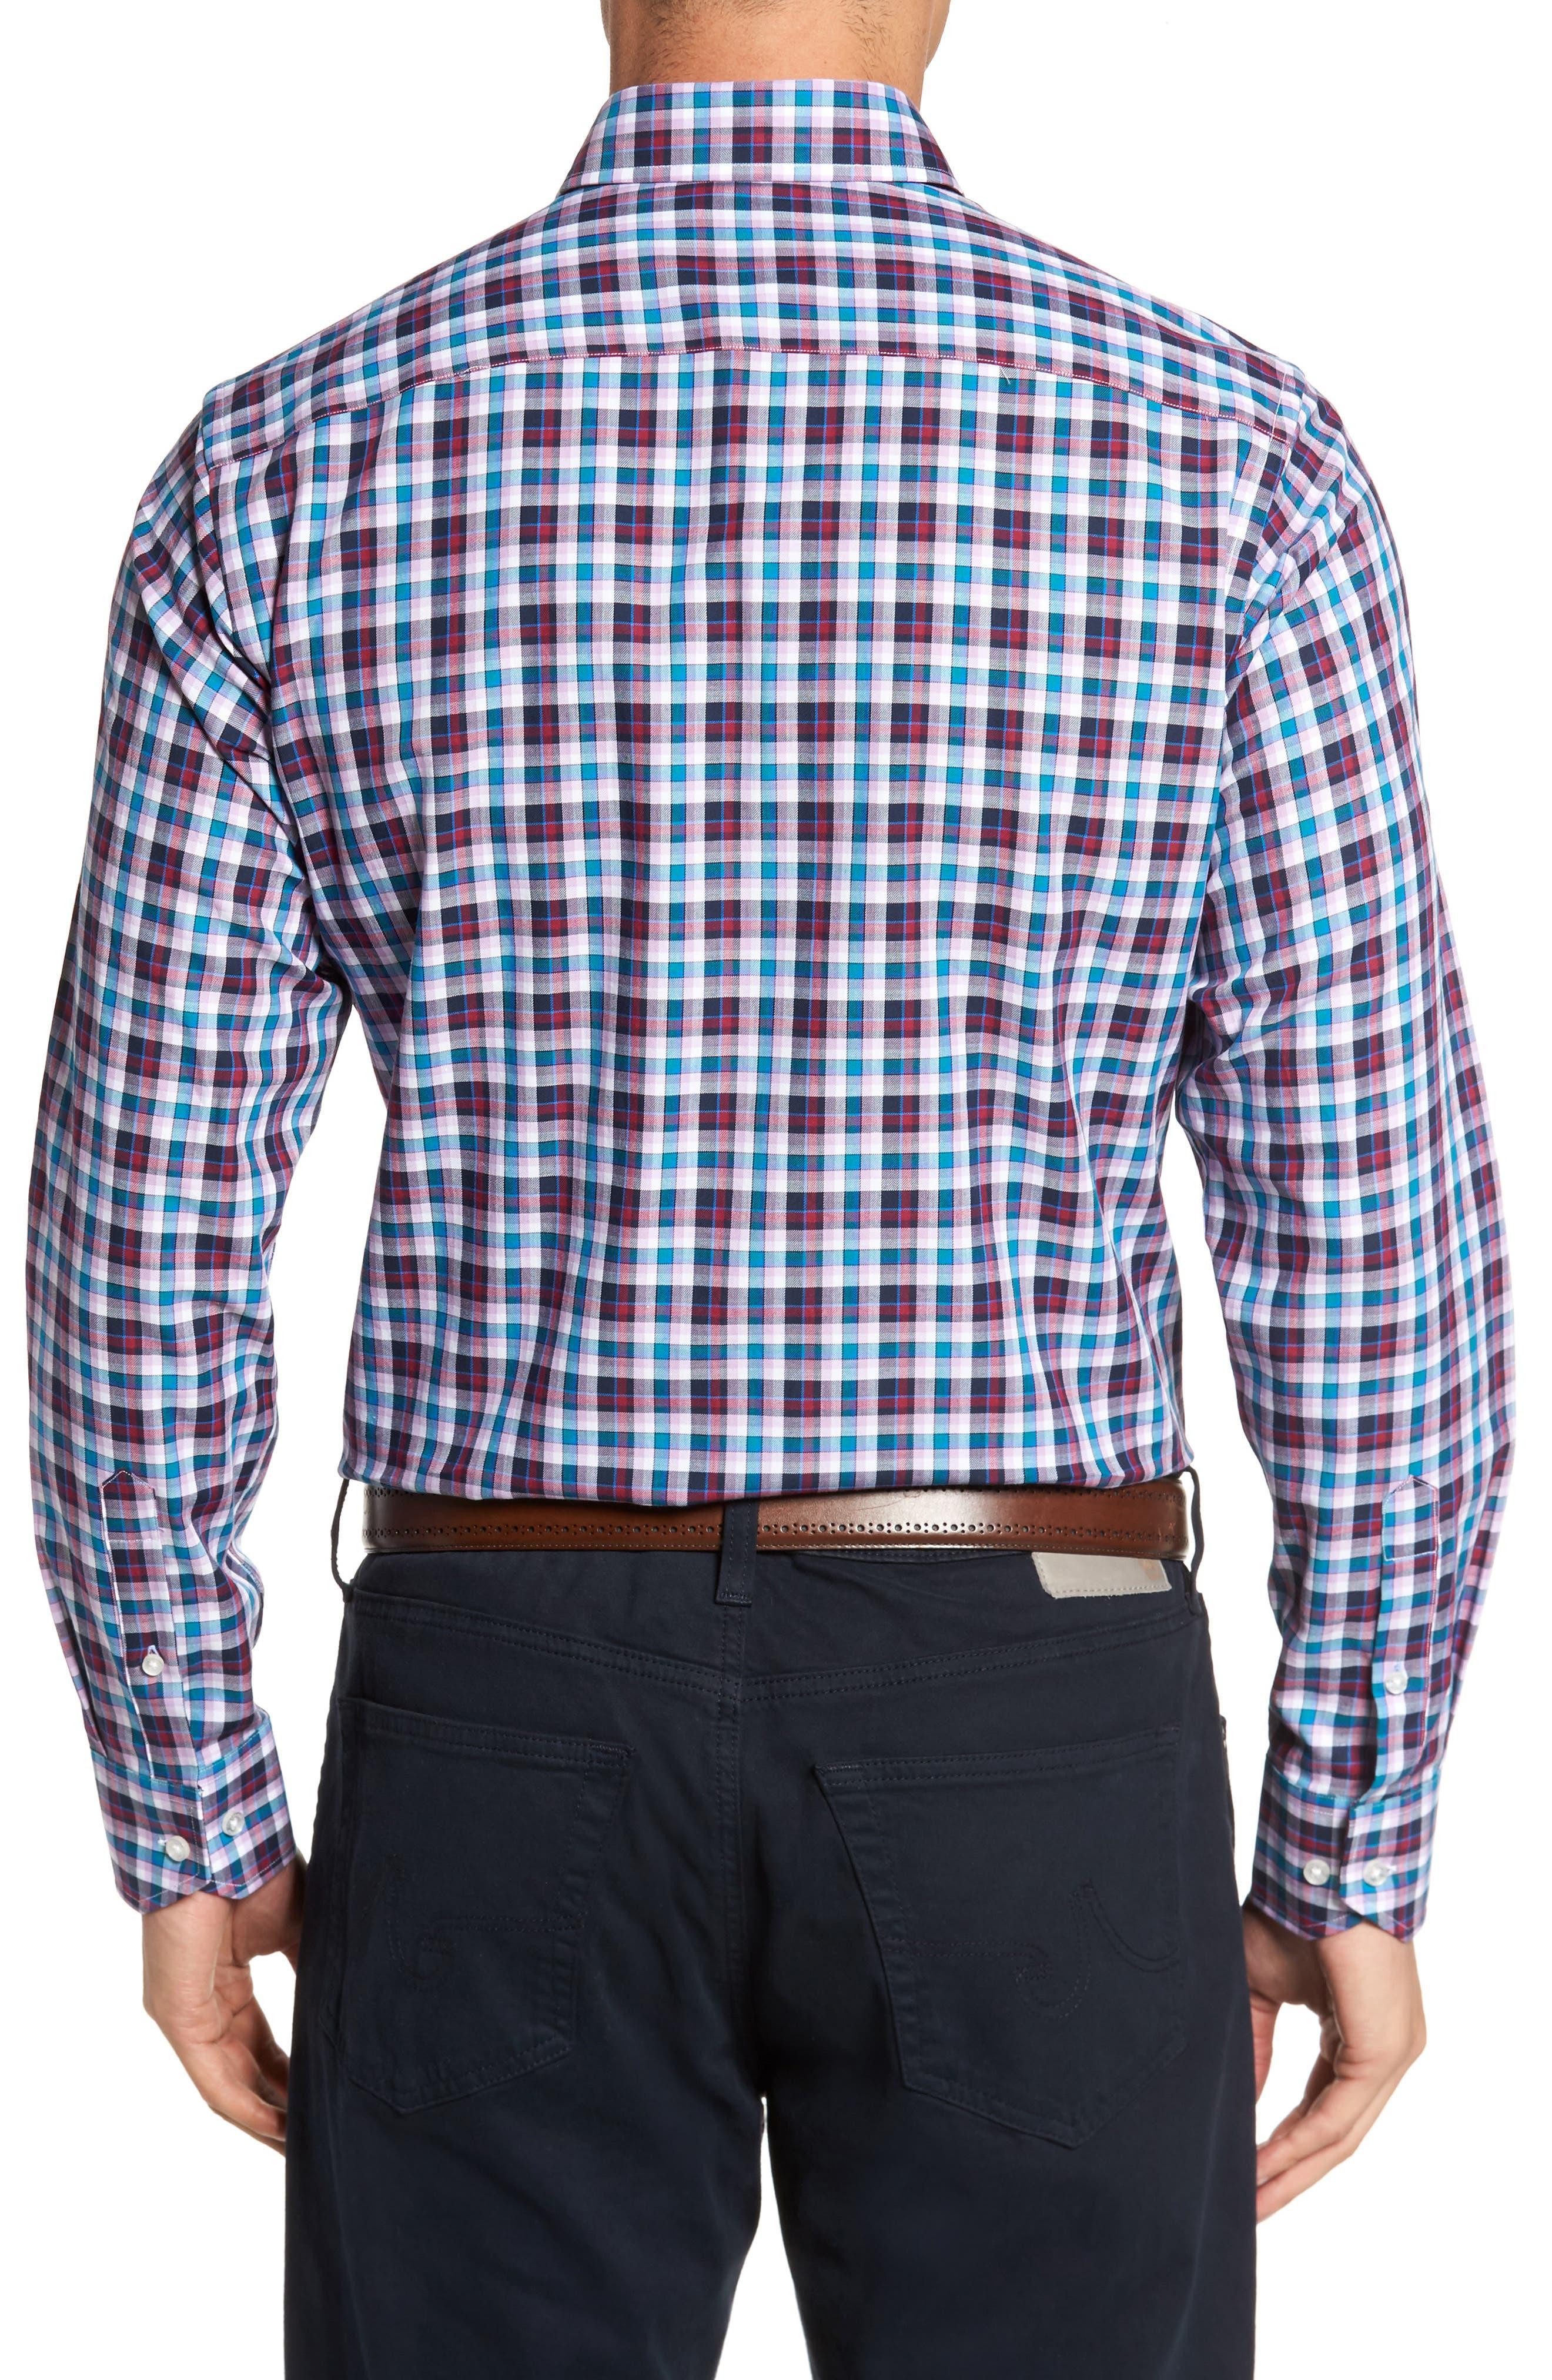 Alternate Image 2  - TailorByrd Coushatta Plaid Sport Shirt